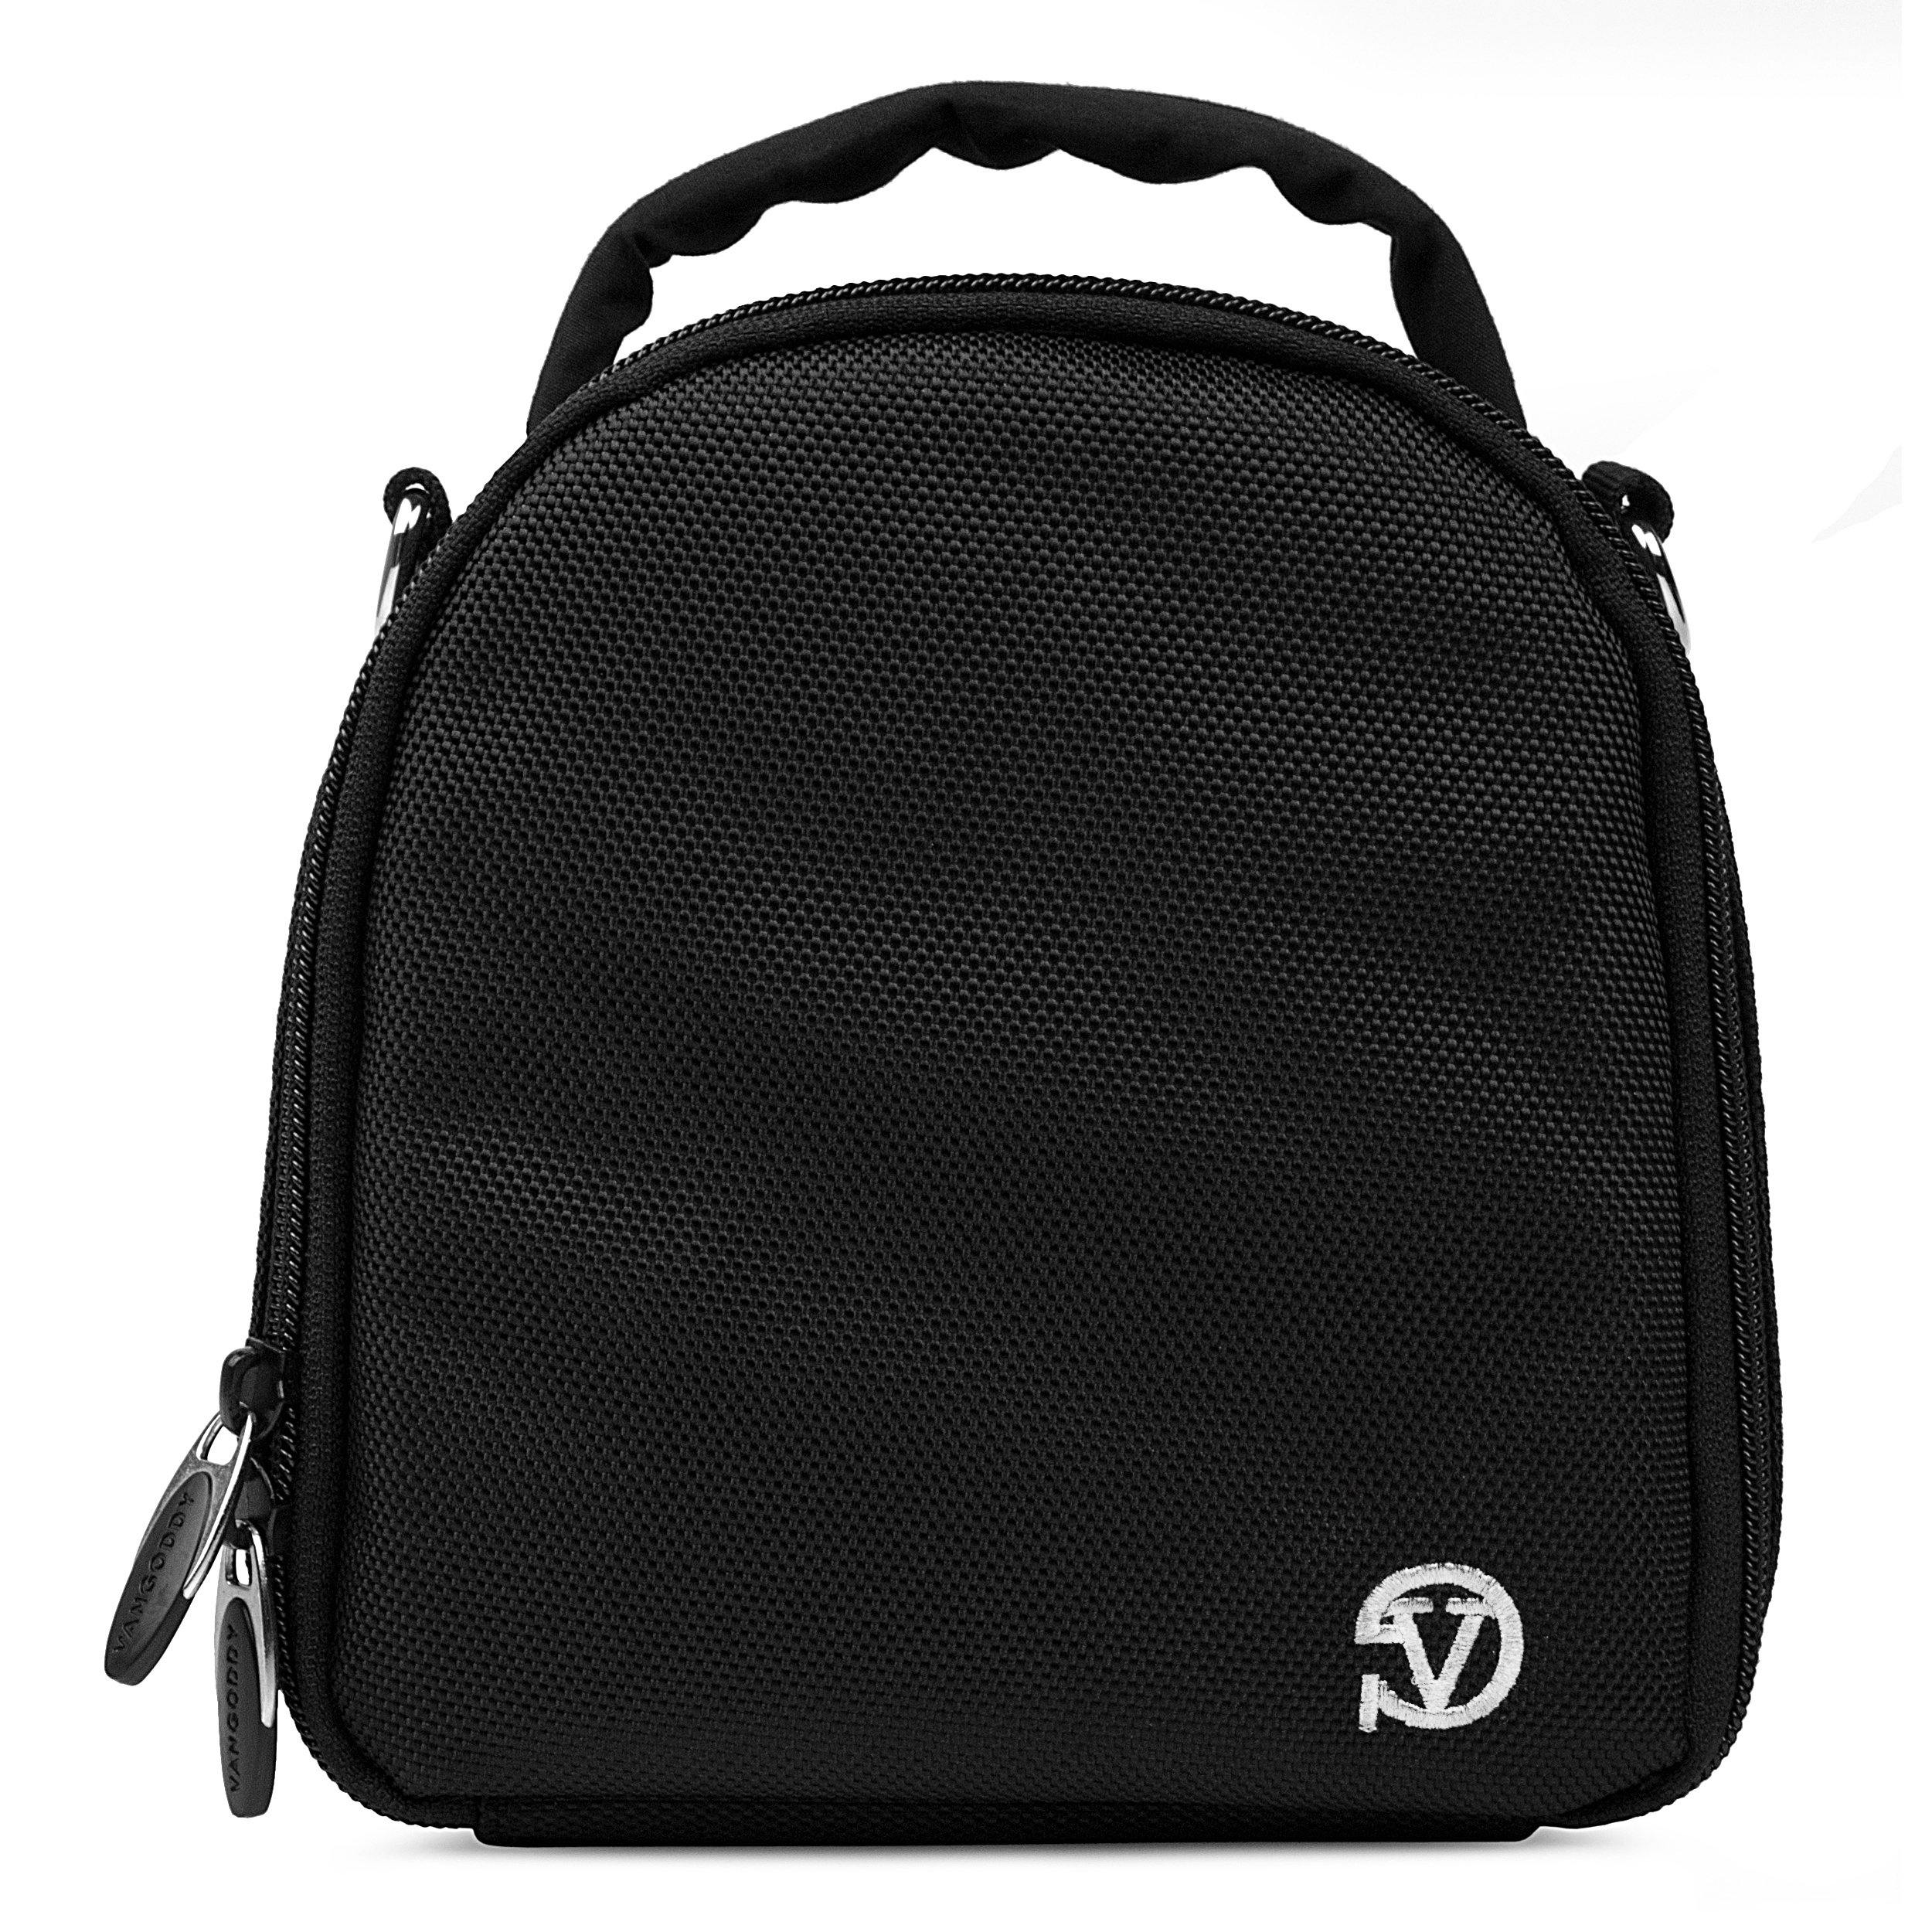 VanGoddy Laurel Carrying Handbag for Fujifilm FinePix S9800 Digital Camera by Vangoddy (Image #3)